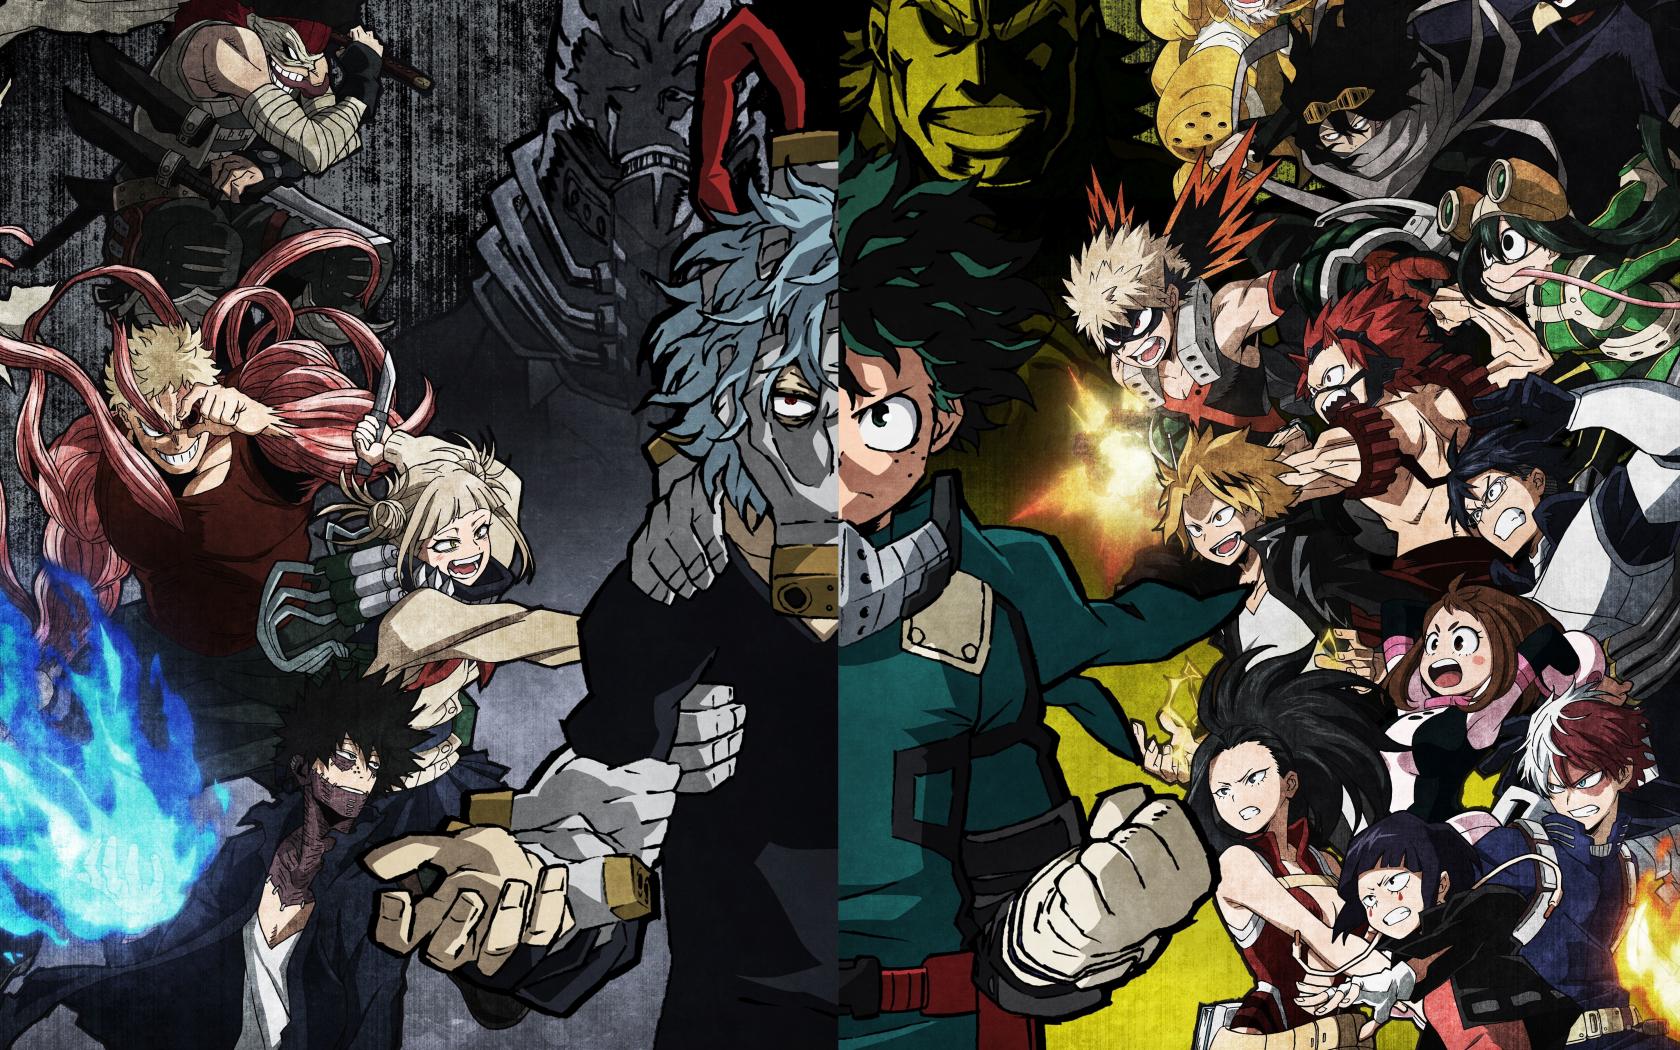 Download 1680x1050 Wallpaper My Hero Academia Izuku Face Off